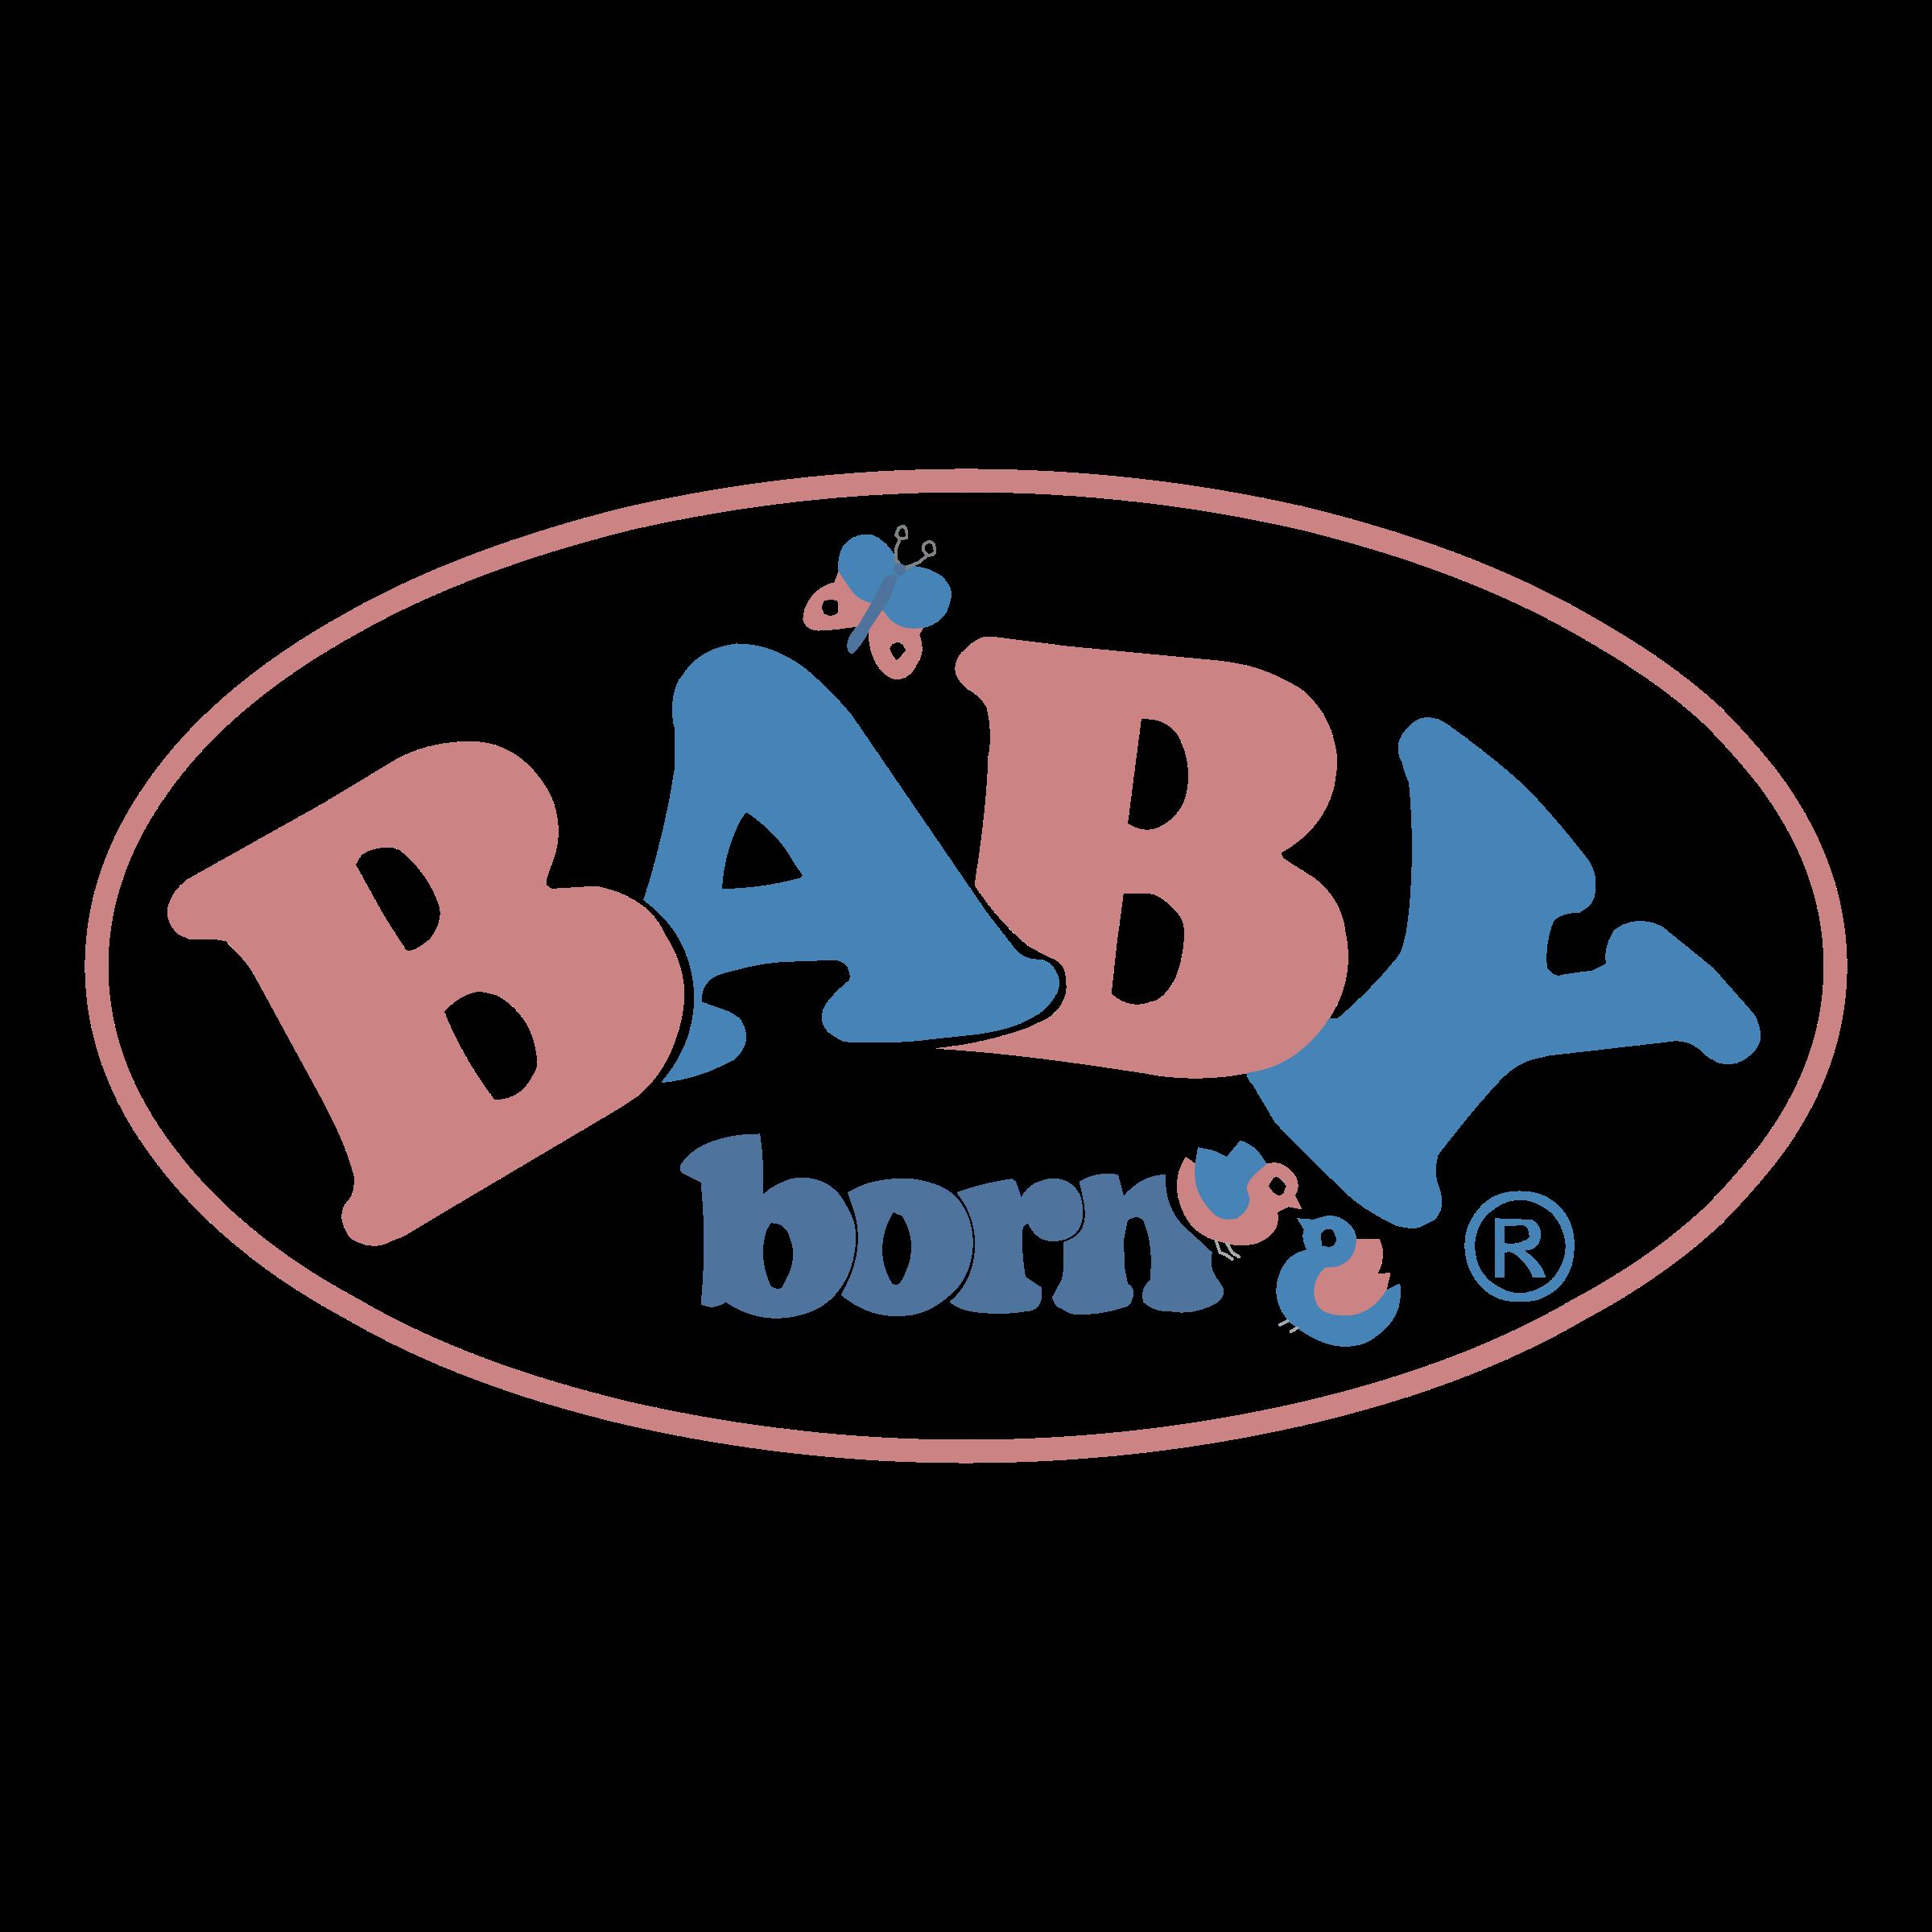 Baby Born Logo PNG Transparent & SVG Vector.